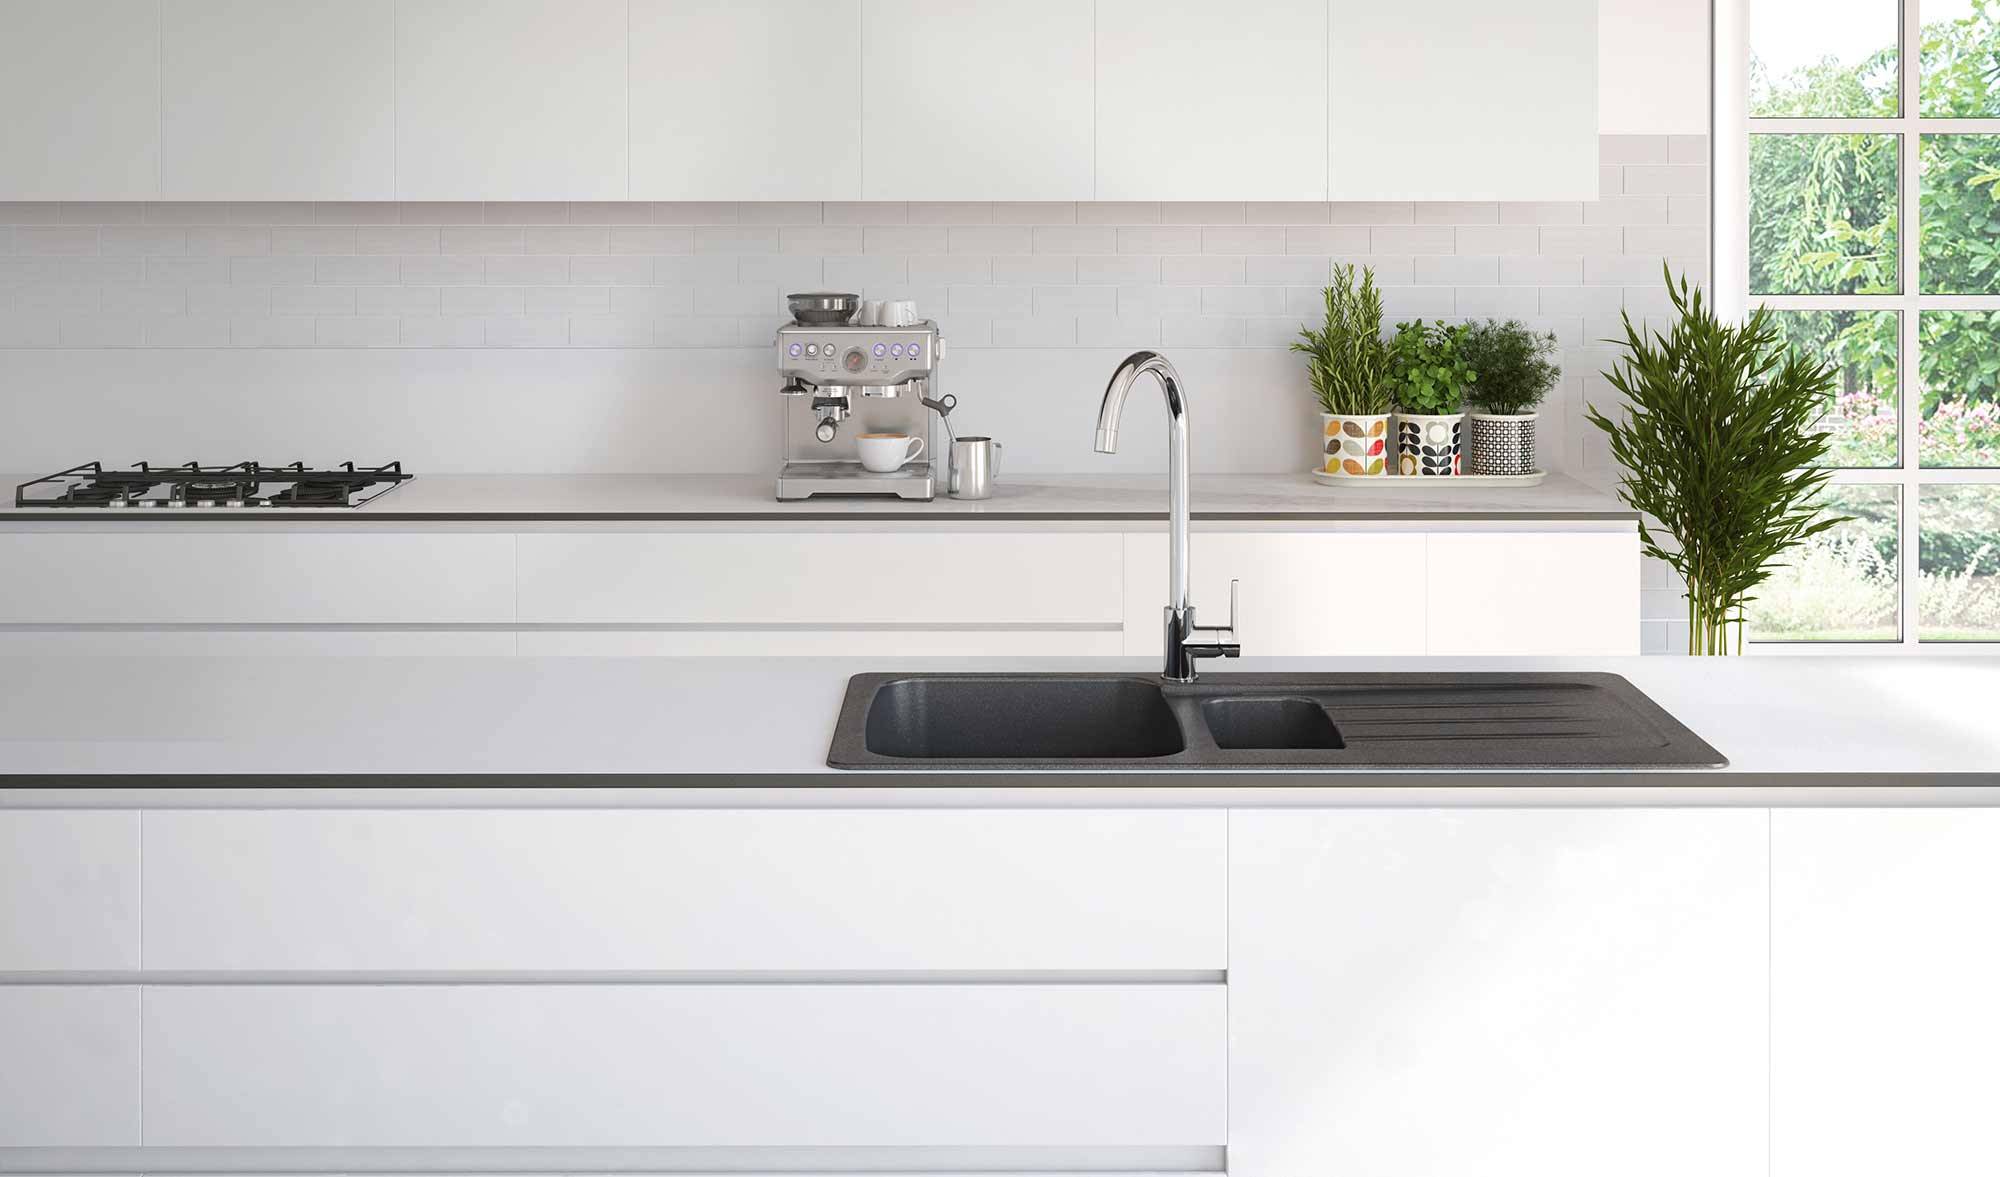 CGI of Brassware in Kitchen Setting